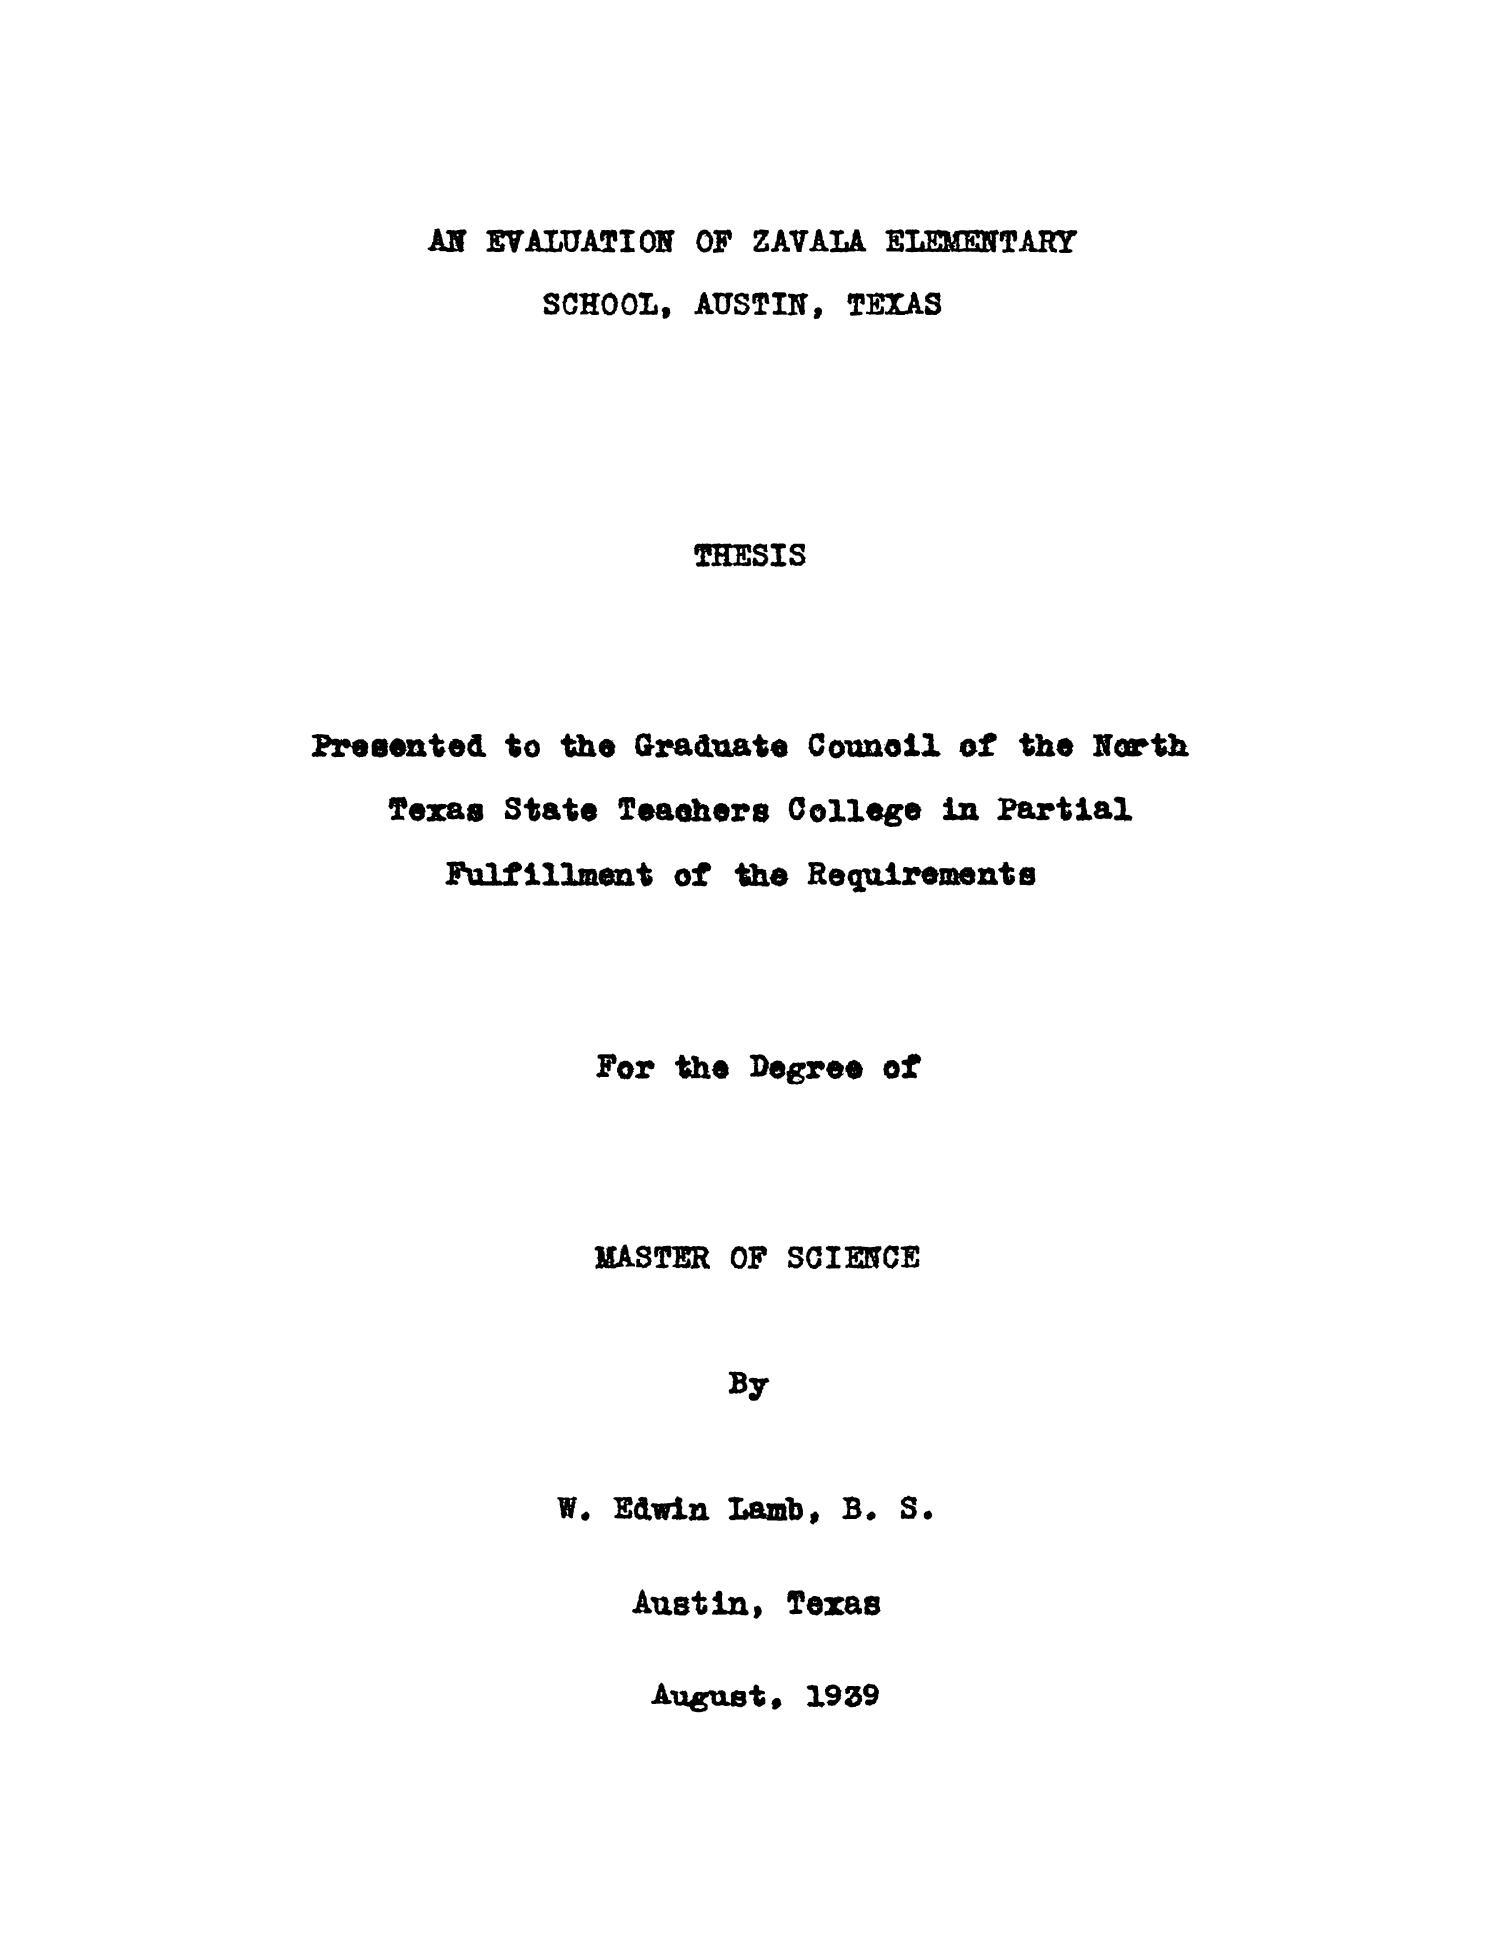 Mcmahon masters thesis south texas